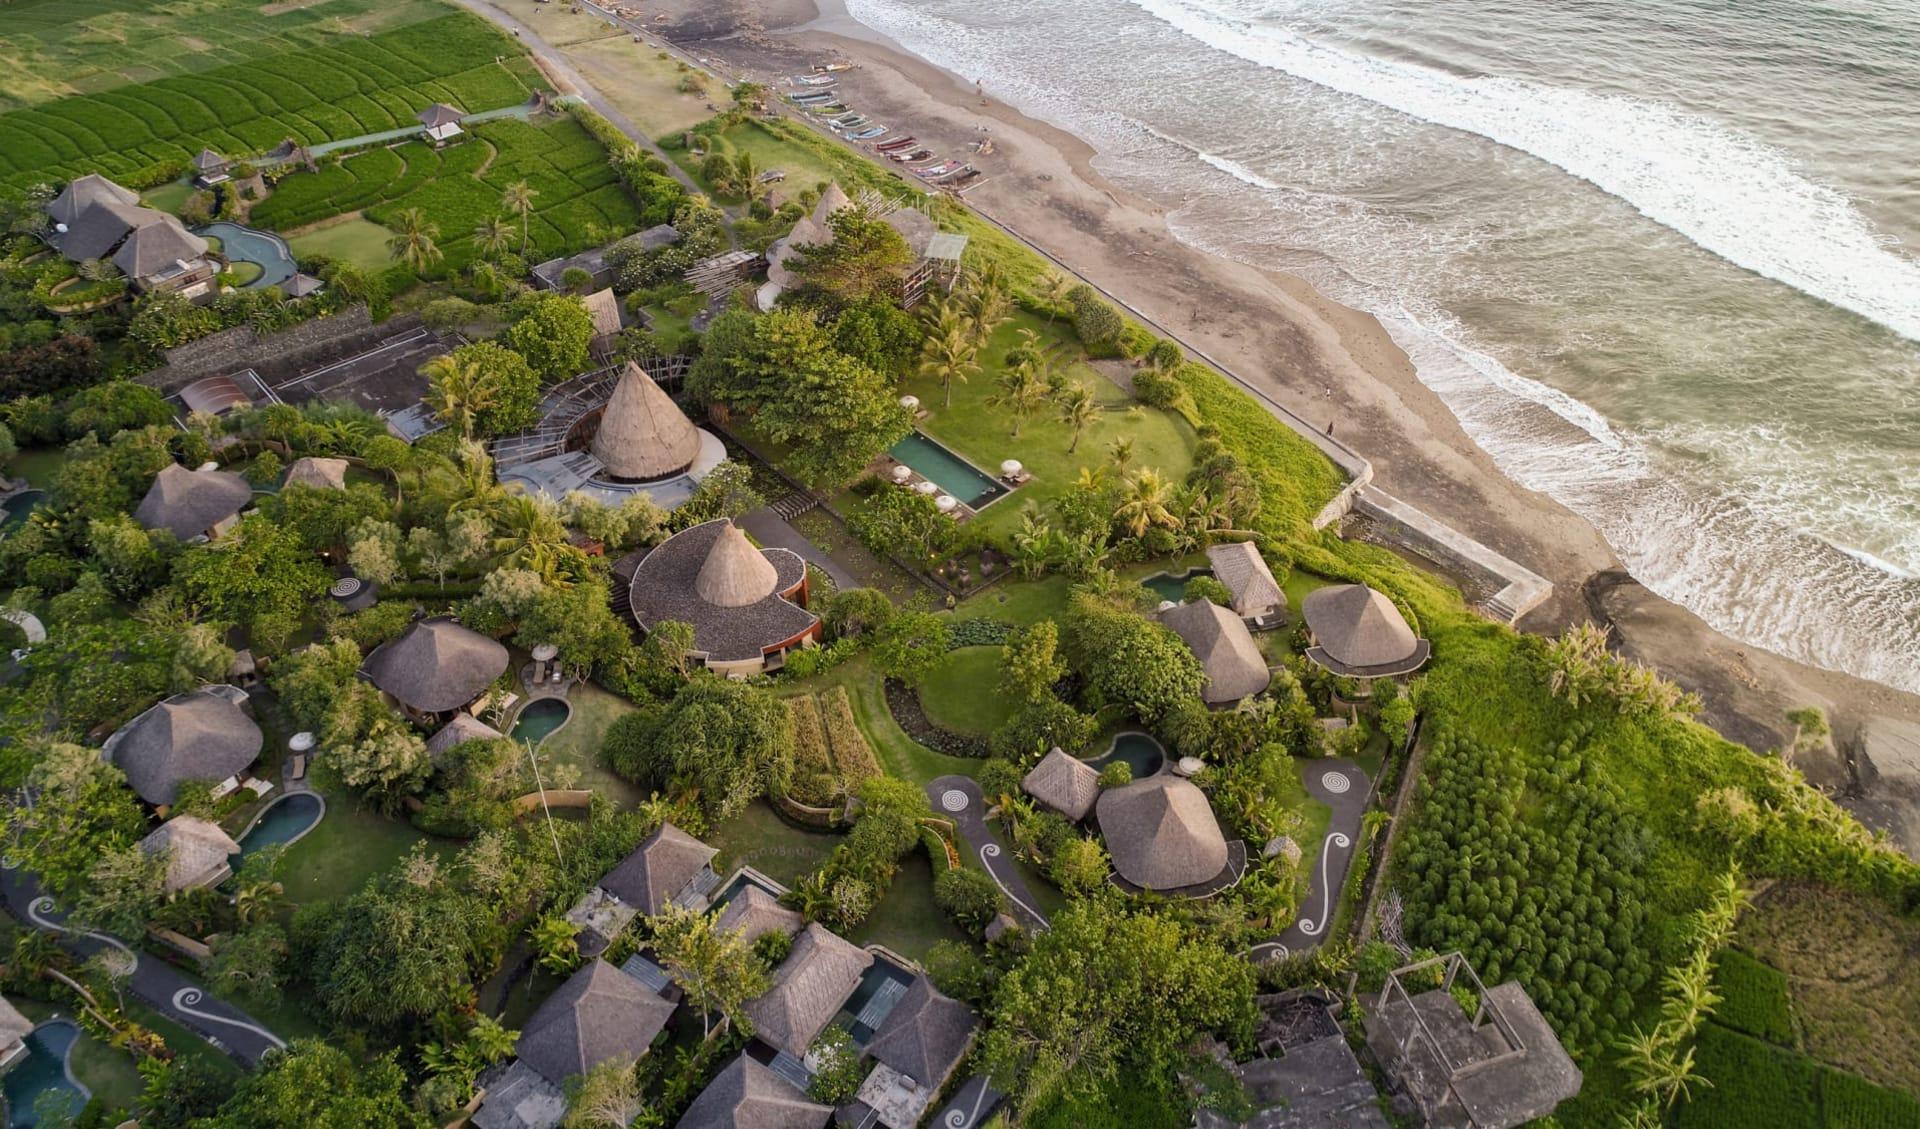 WakaGangga in Südbali: Aerial View